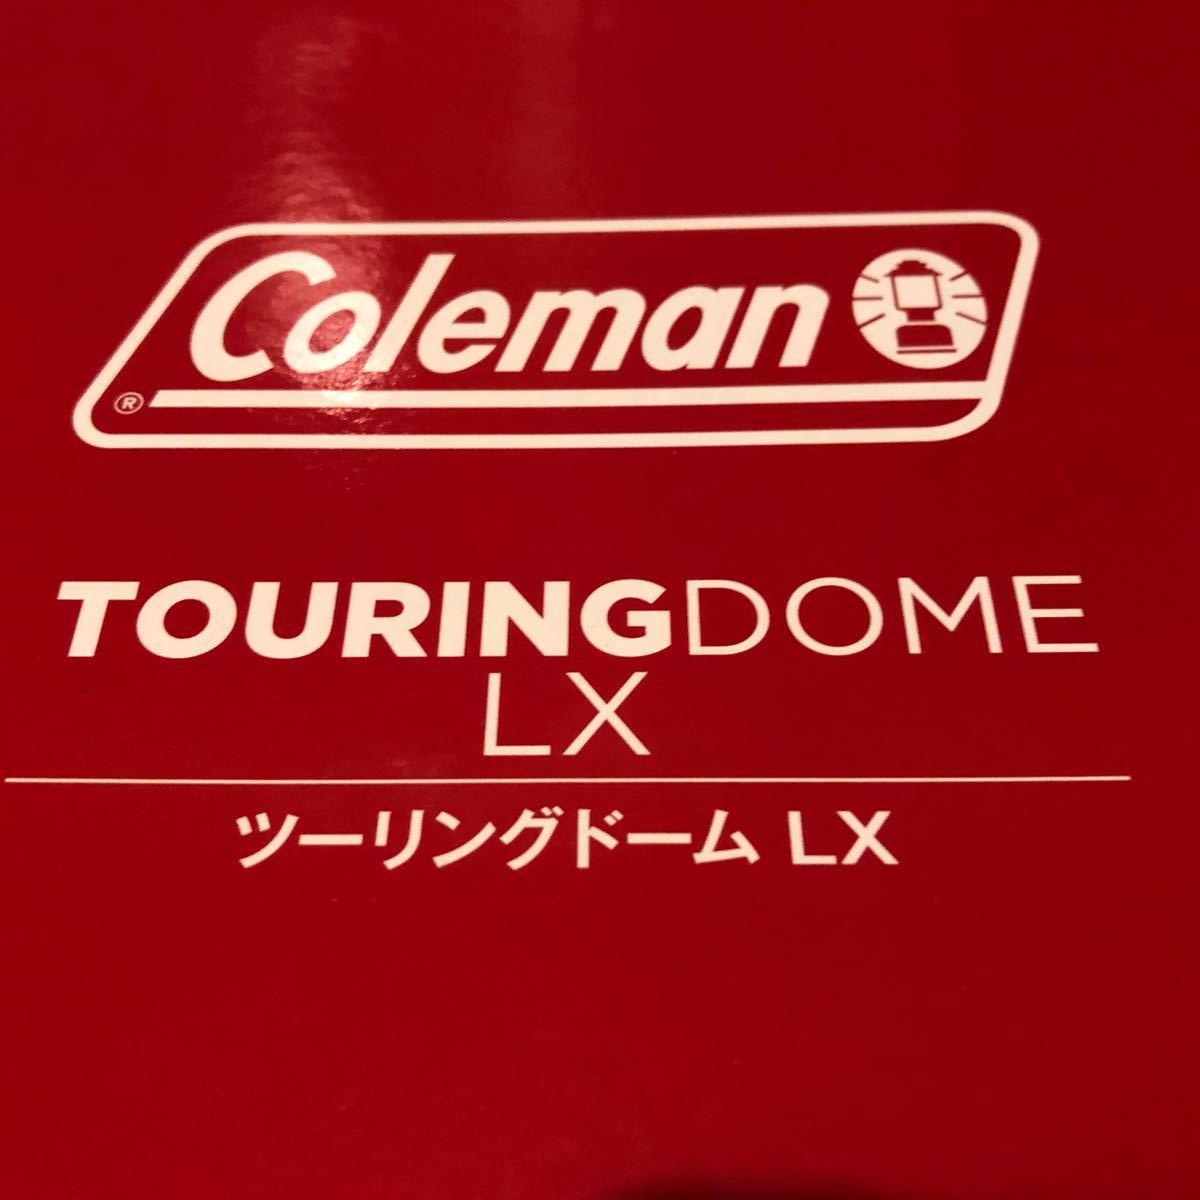 Coleman コールマン ツーリングドームLX  直営店限定 新品未開封